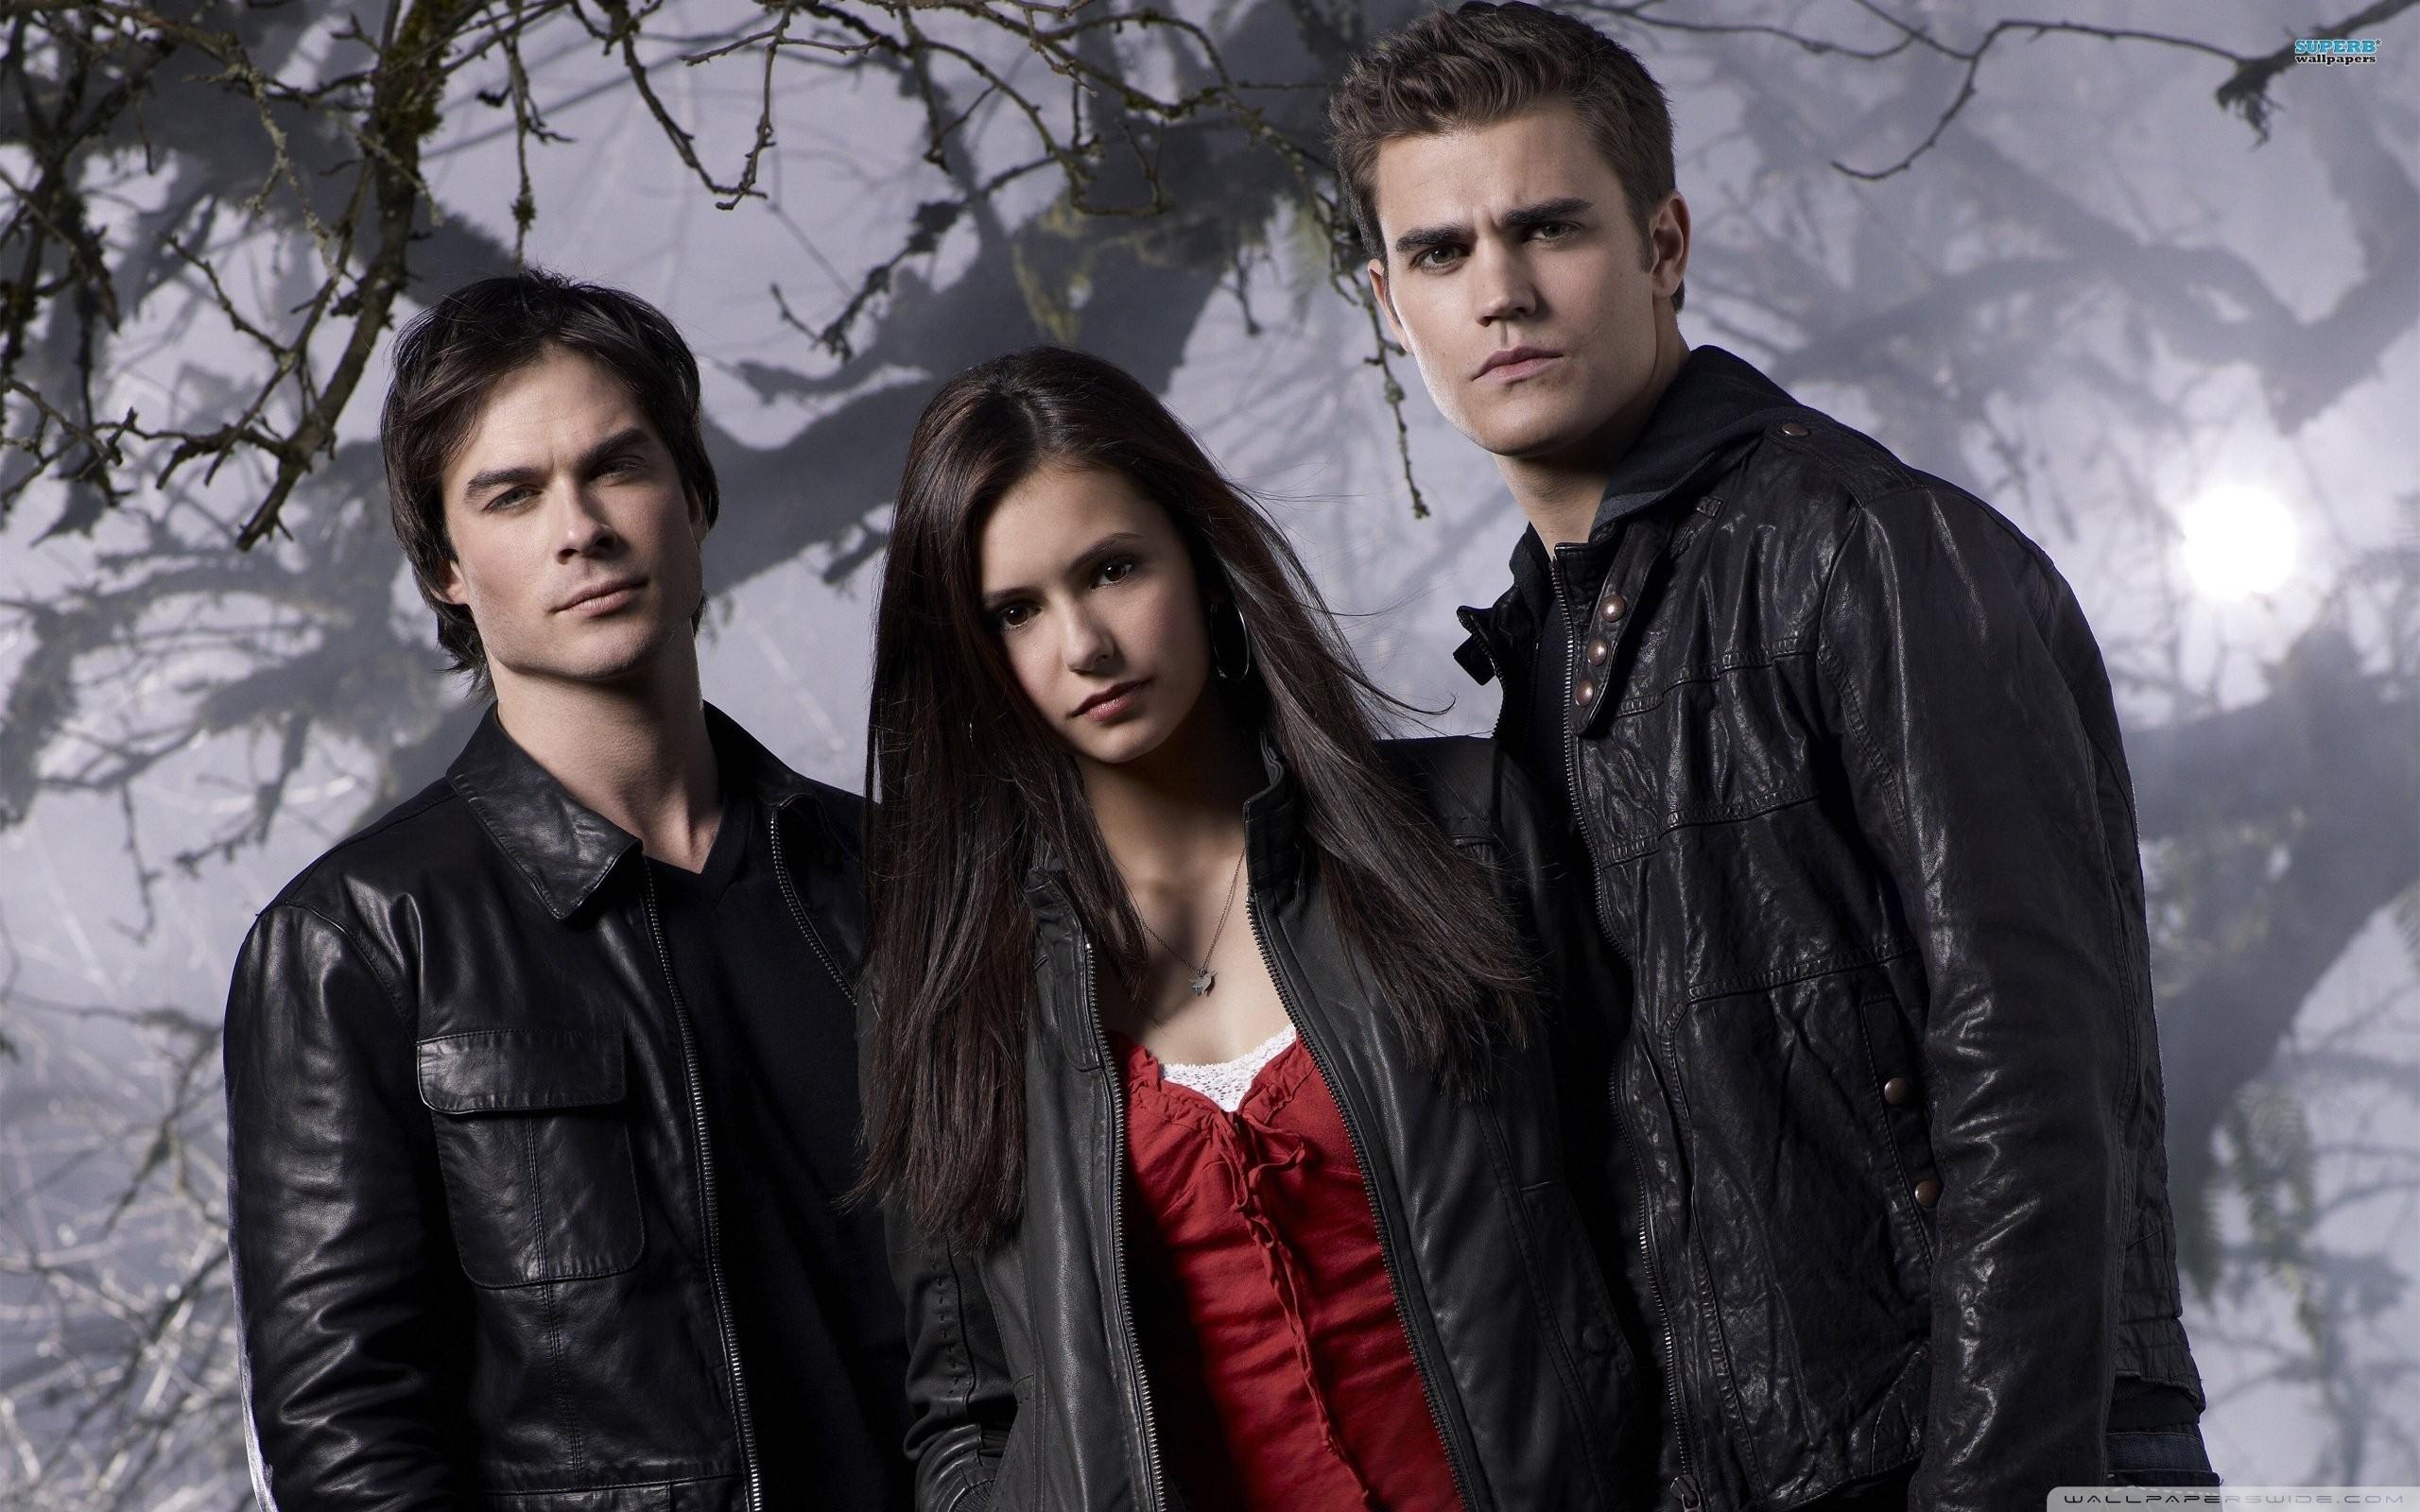 vampire diaries cast - HD1280×1024